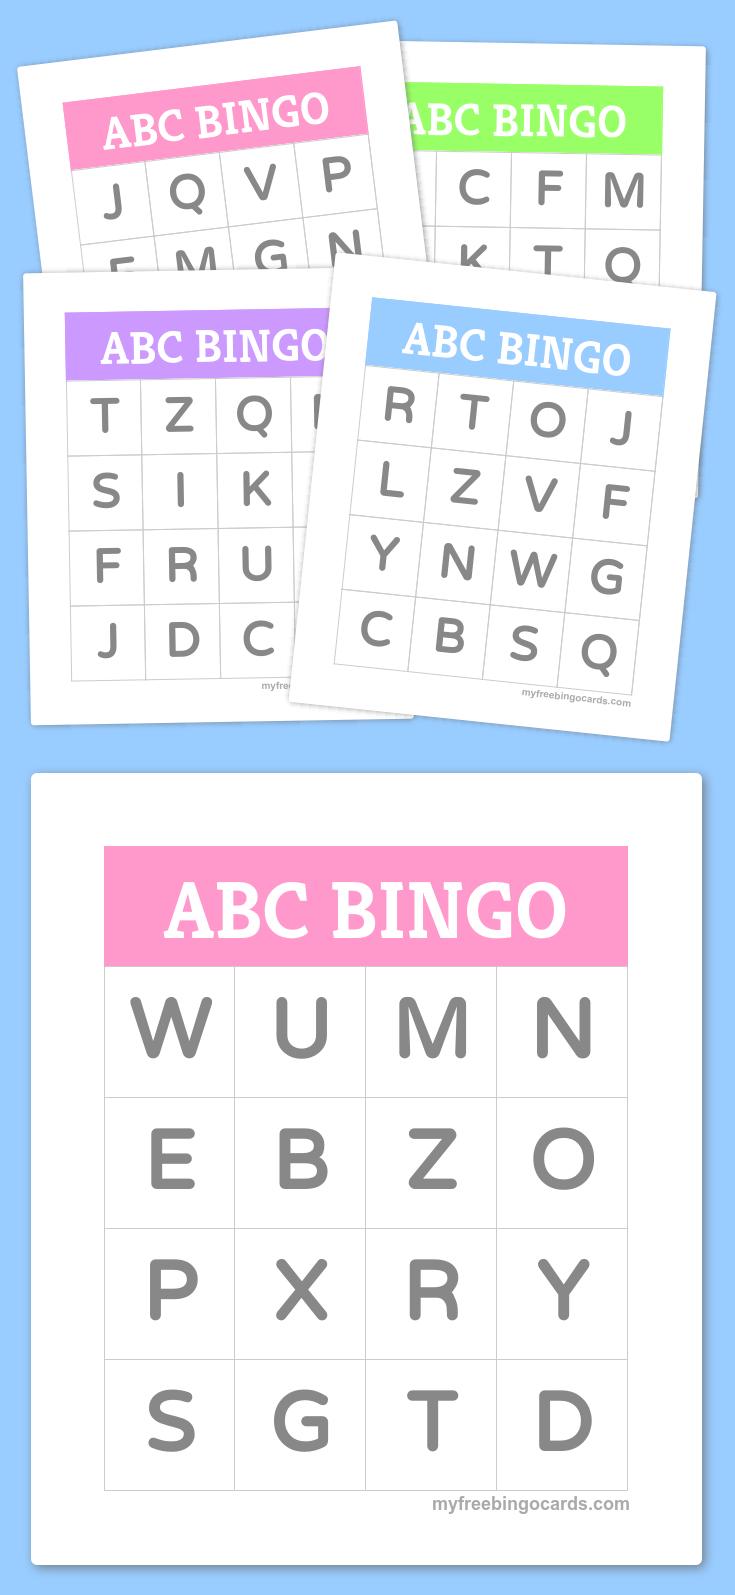 Free Printable Bingo Cards   Bingo Cards   Preschool Learning, Abc - Free Printable Number Bingo Cards 1 20